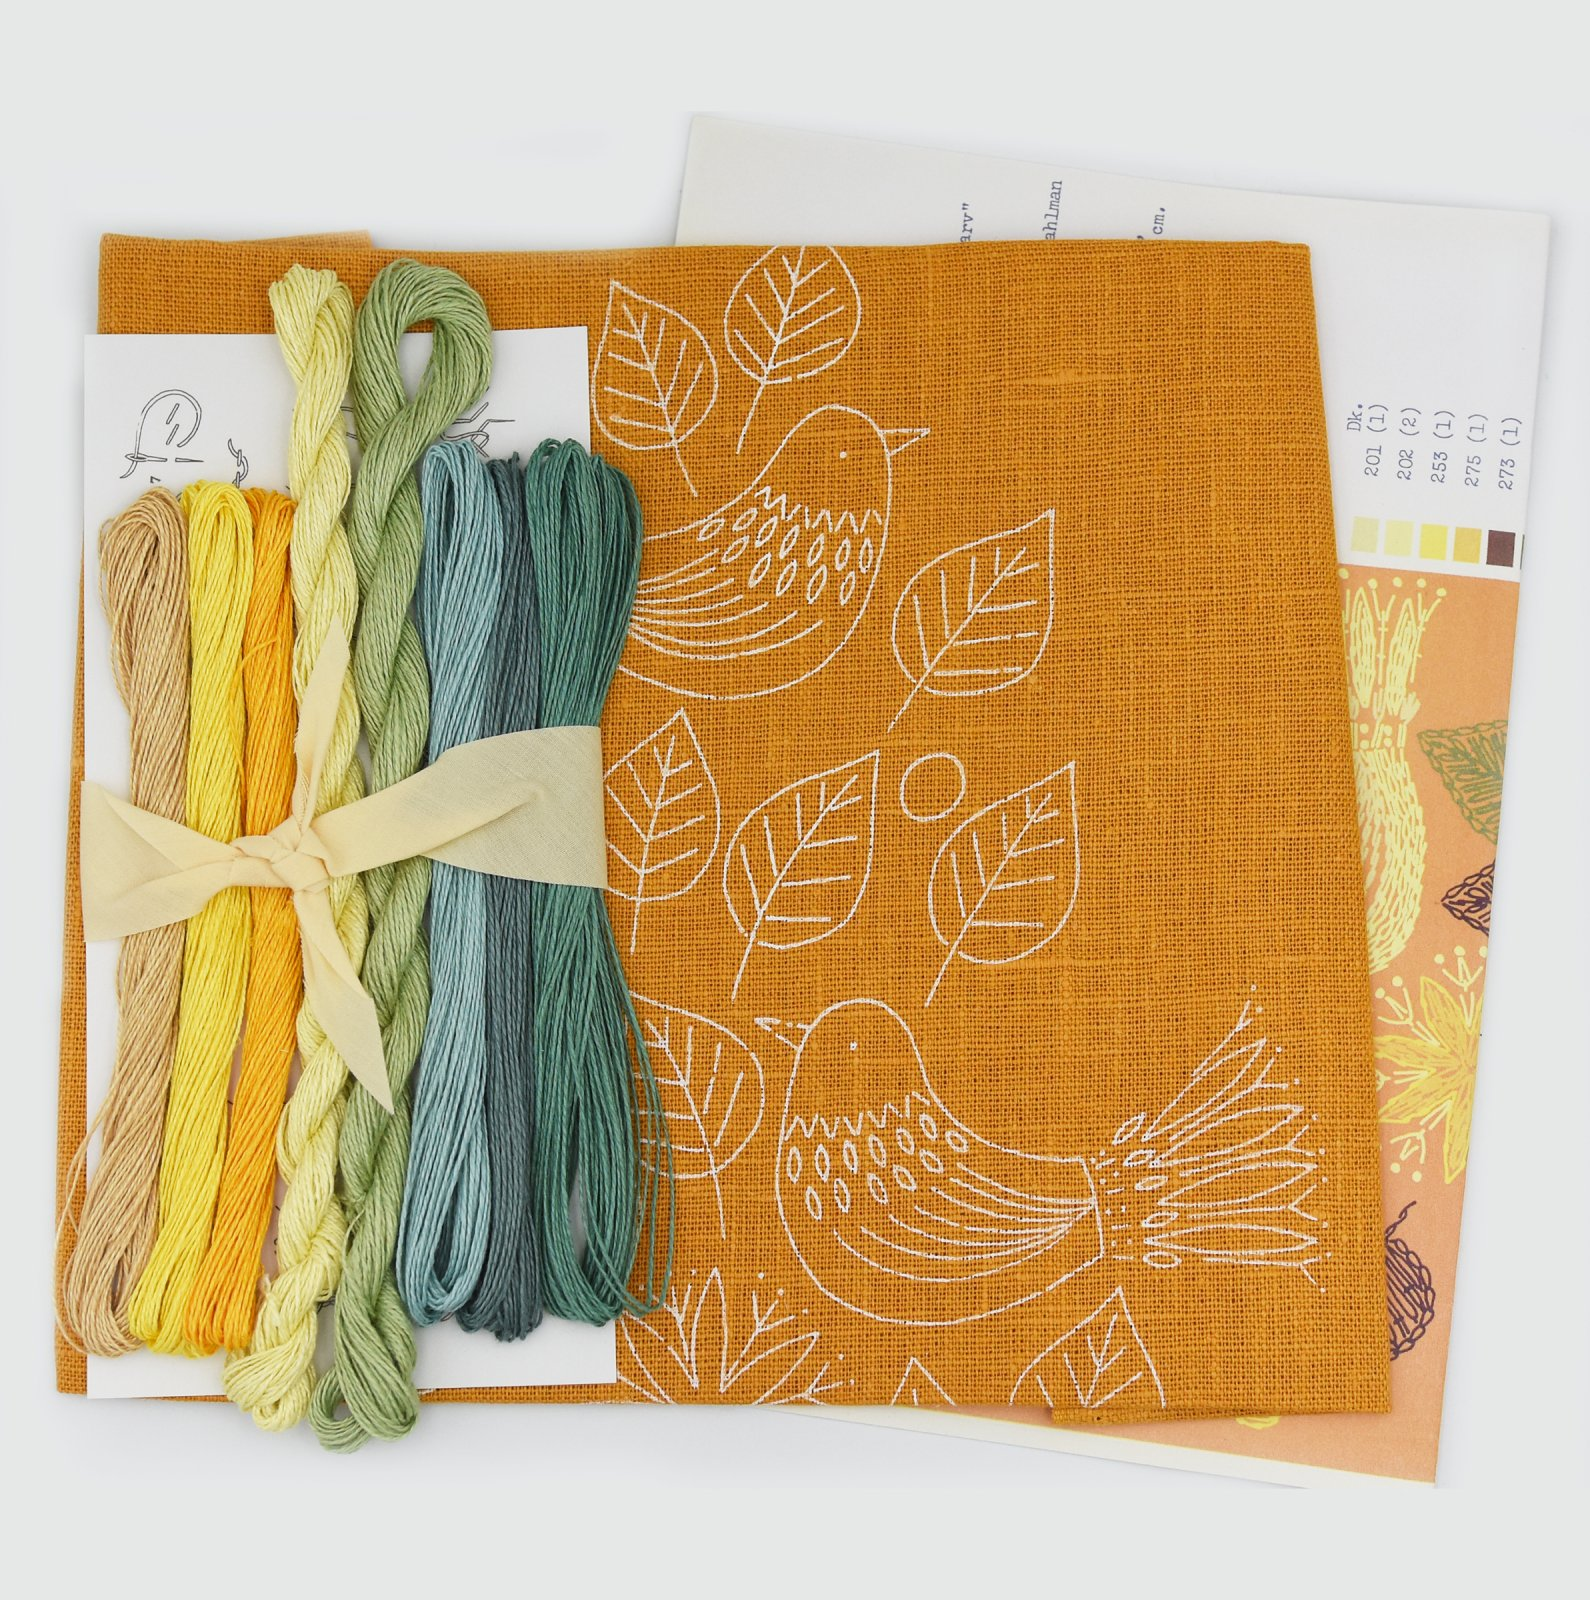 Linladan - Mustard Sparrows - Nordiska print with linen threads